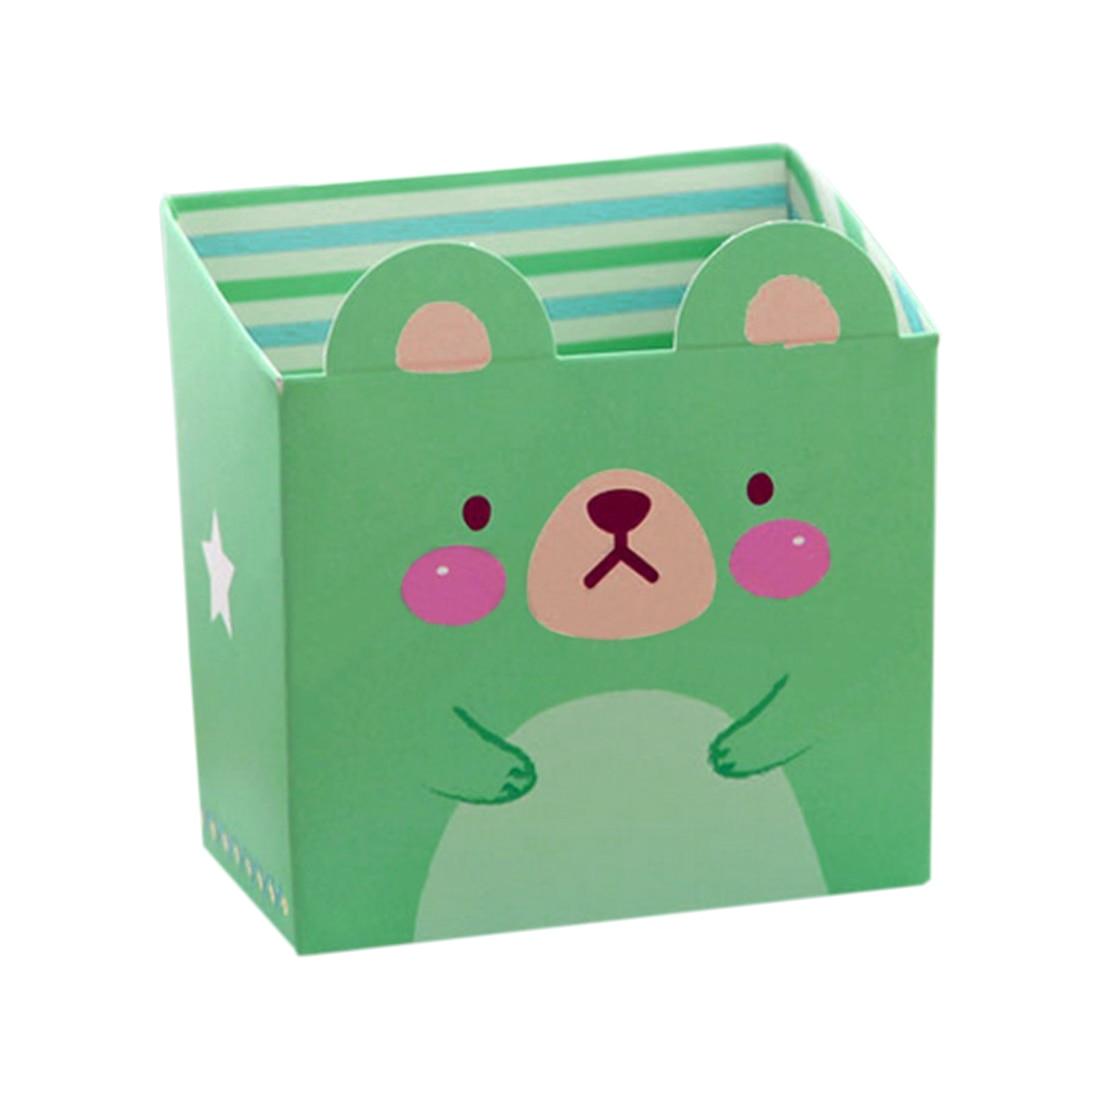 Cute Cat Cartoon Paper Stationery Makeup Cosmetic Desk Storage Box DIY